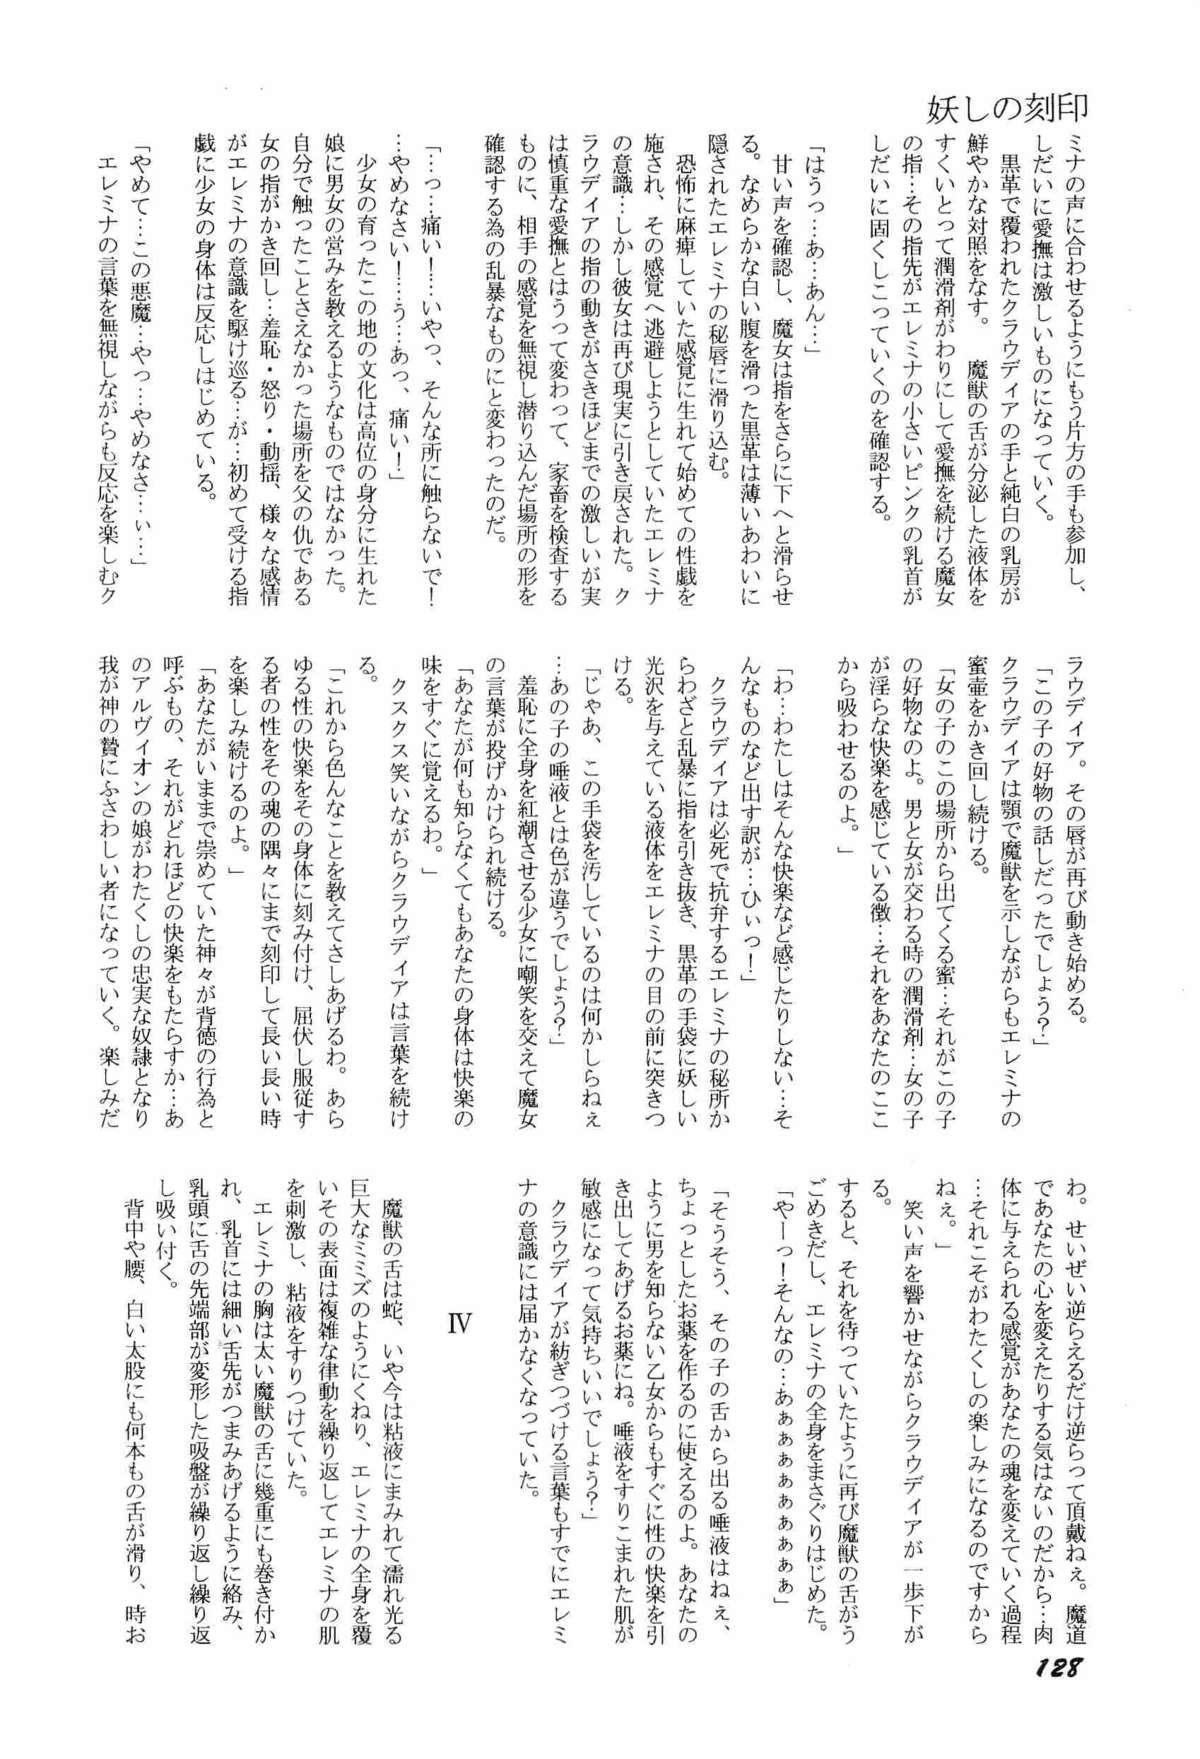 Bisyoujo Anthology '93 jyoukan 130